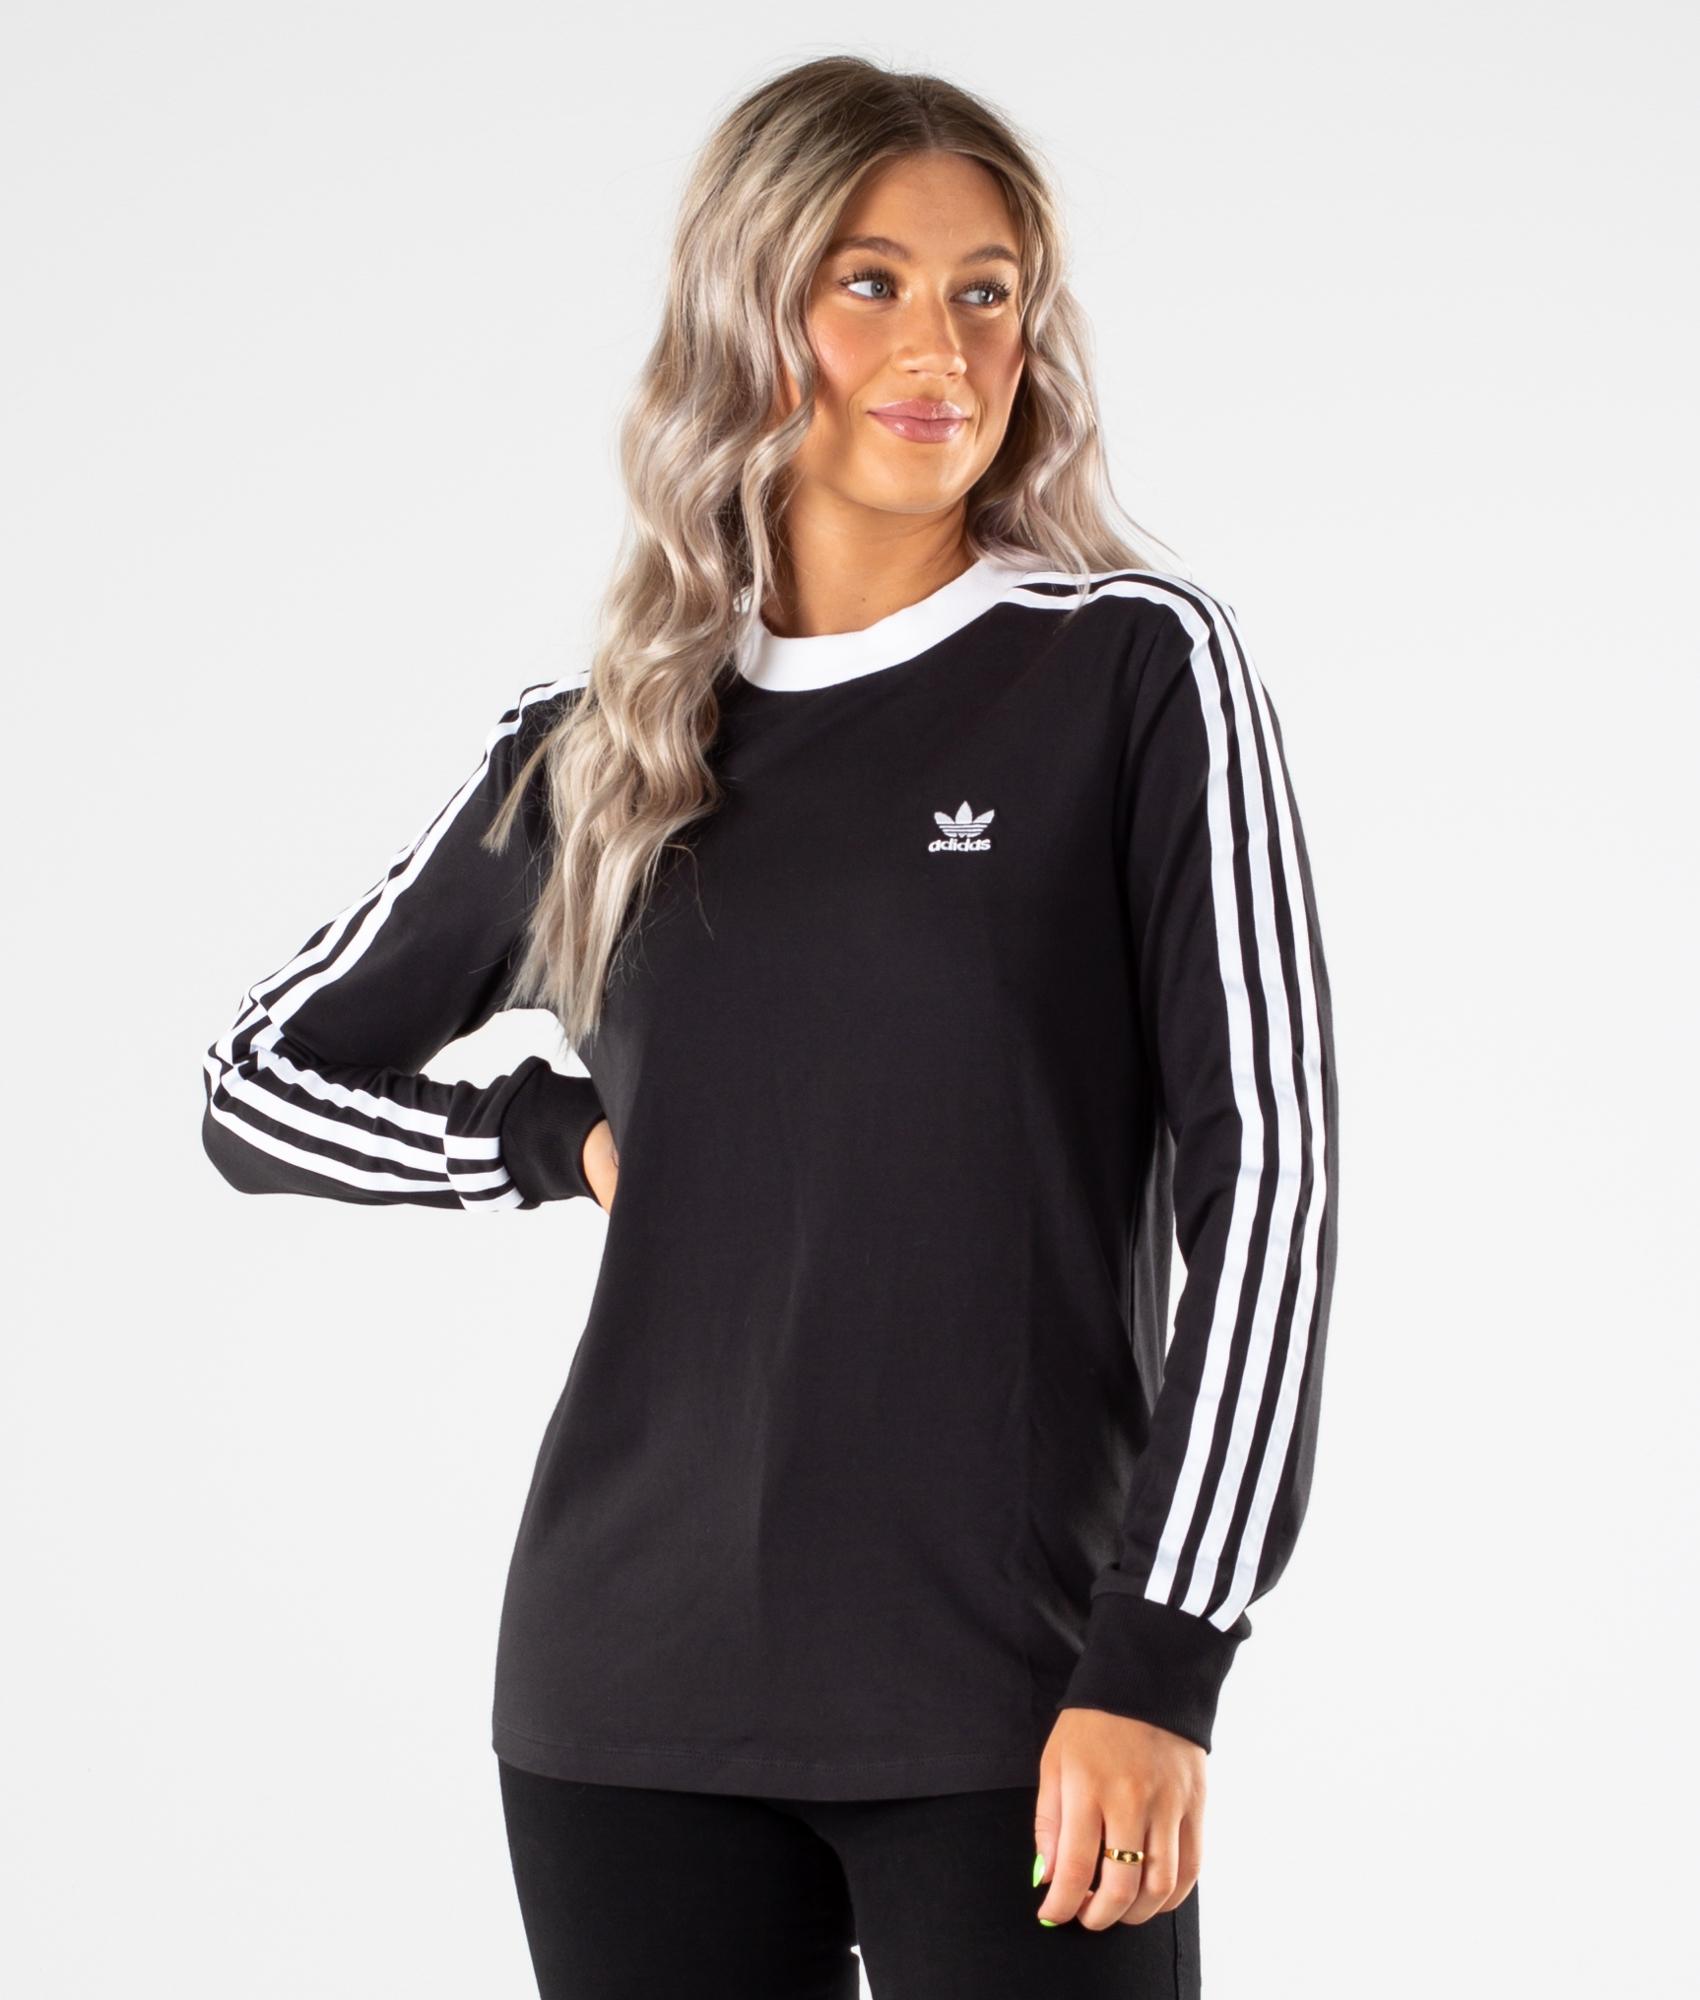 Adidas Originals Sst Tt Takki Collegiate Green Ridestore.fi